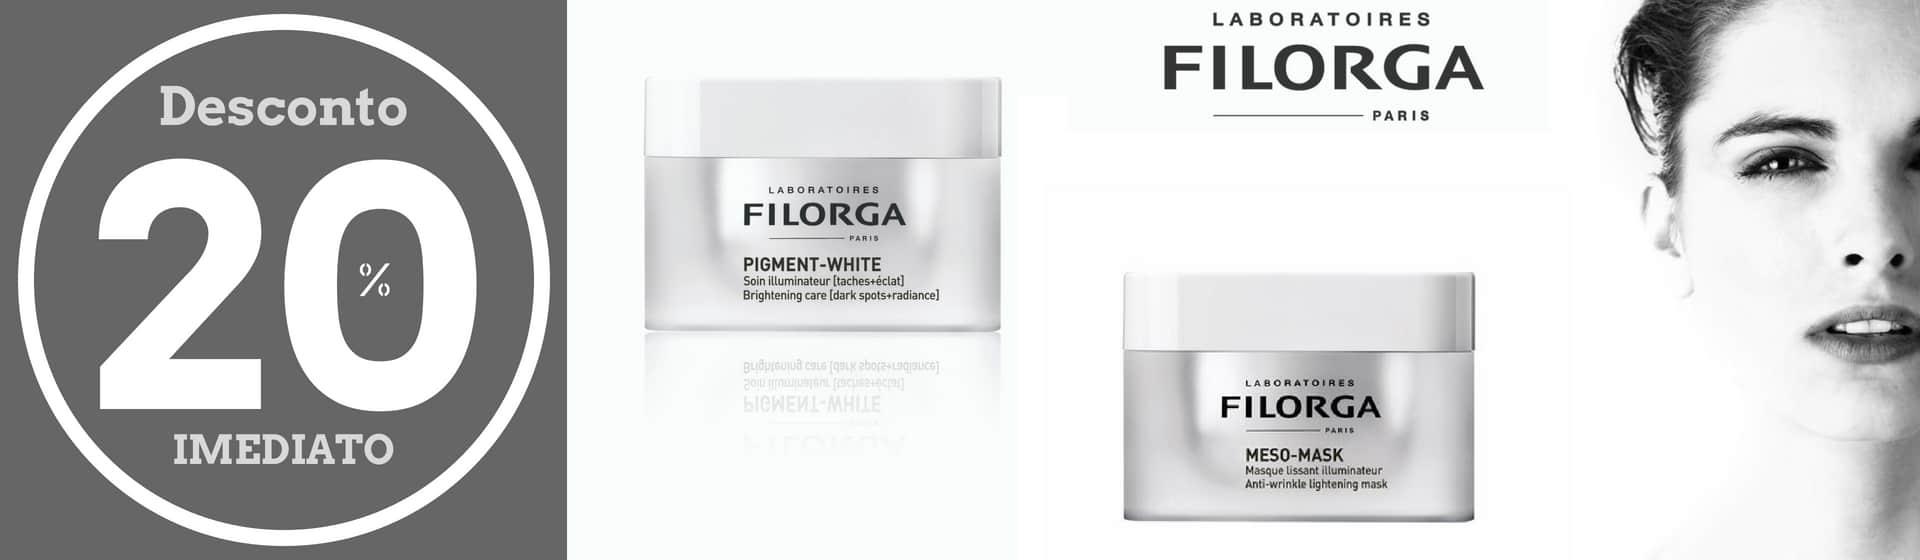 Filorga_Promoção_20%